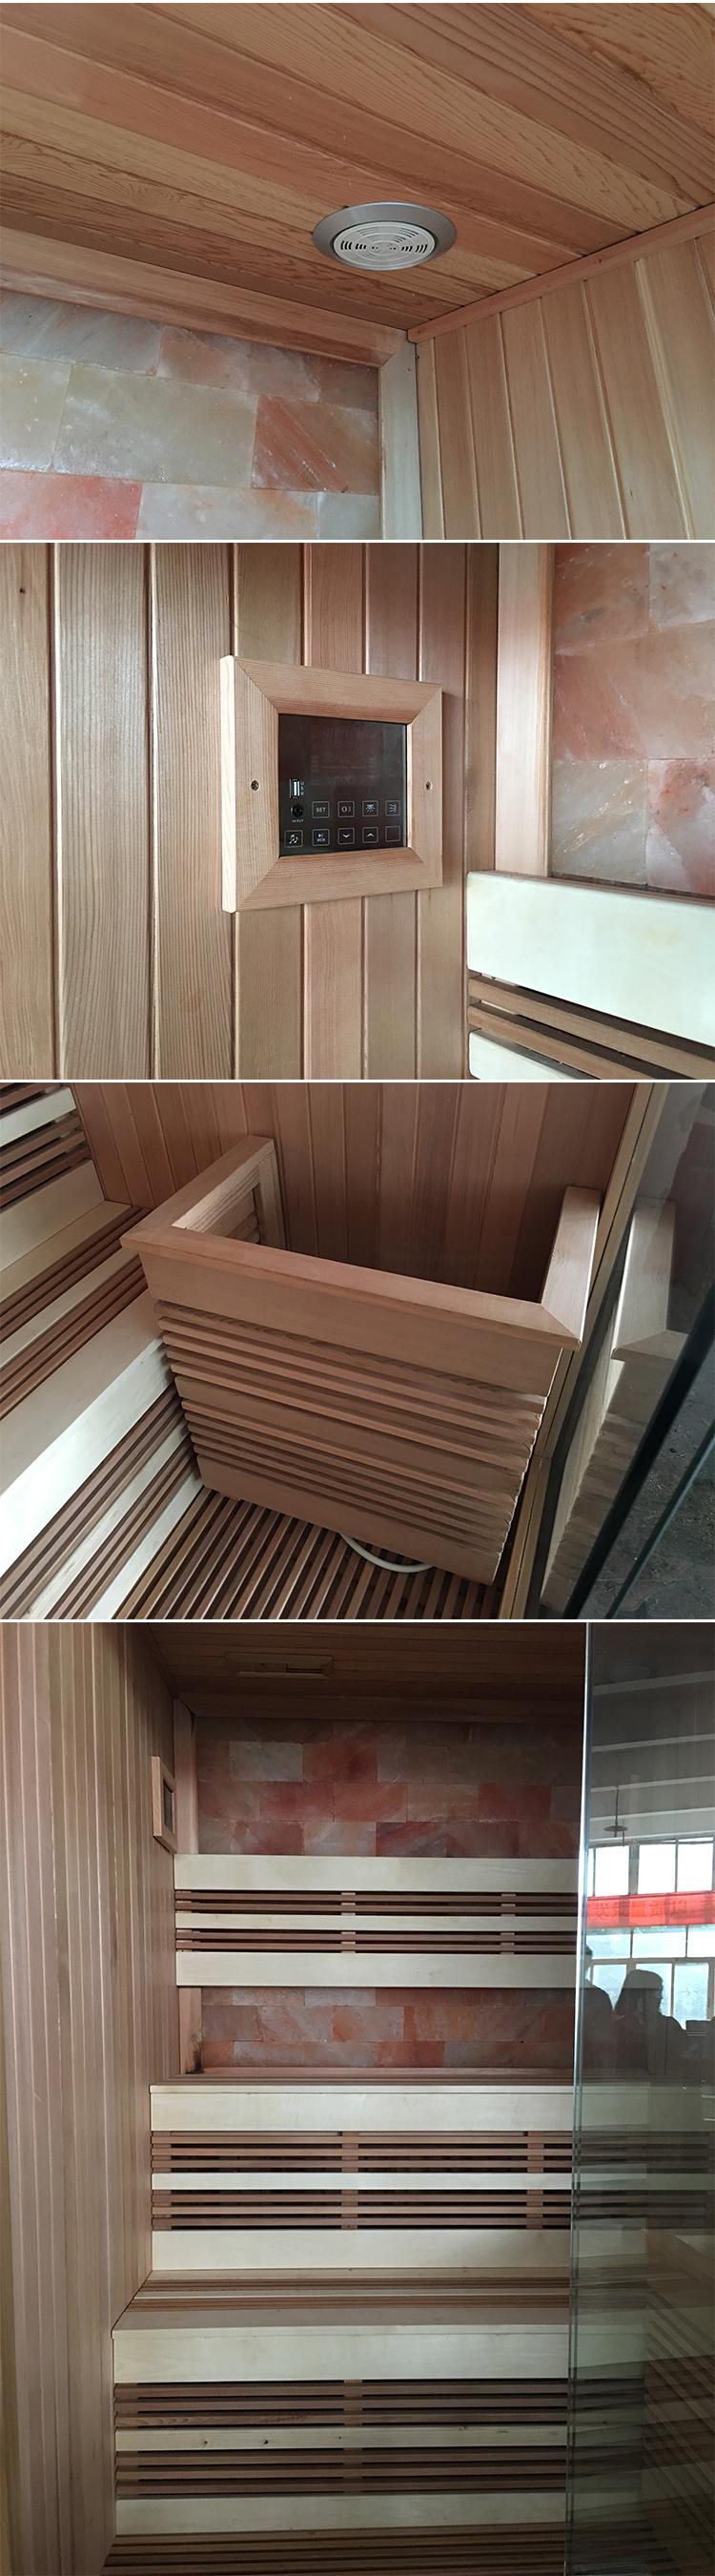 Wonderful HS SR6067M Cheap Sauna Cabin,corner Sauna House,outdoor Wooden Sauna